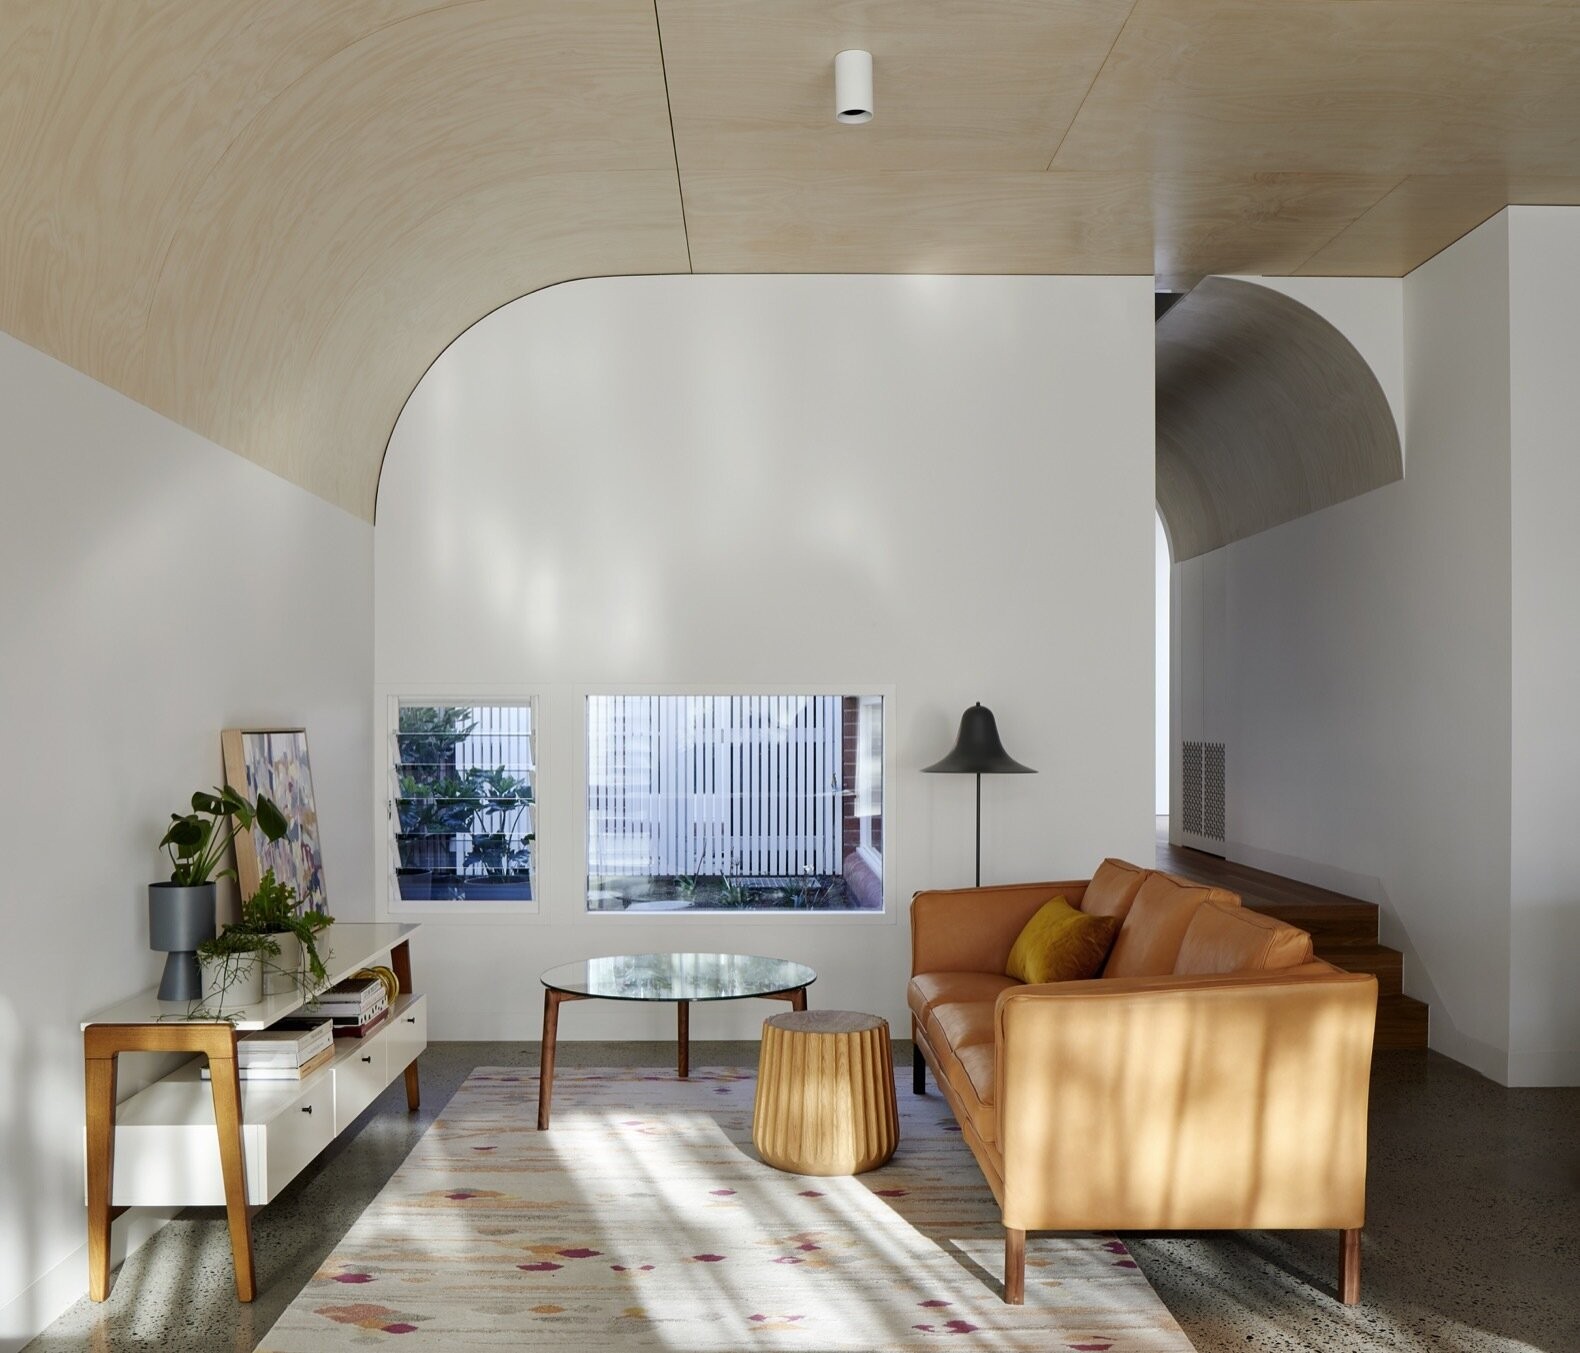 Deco House living room